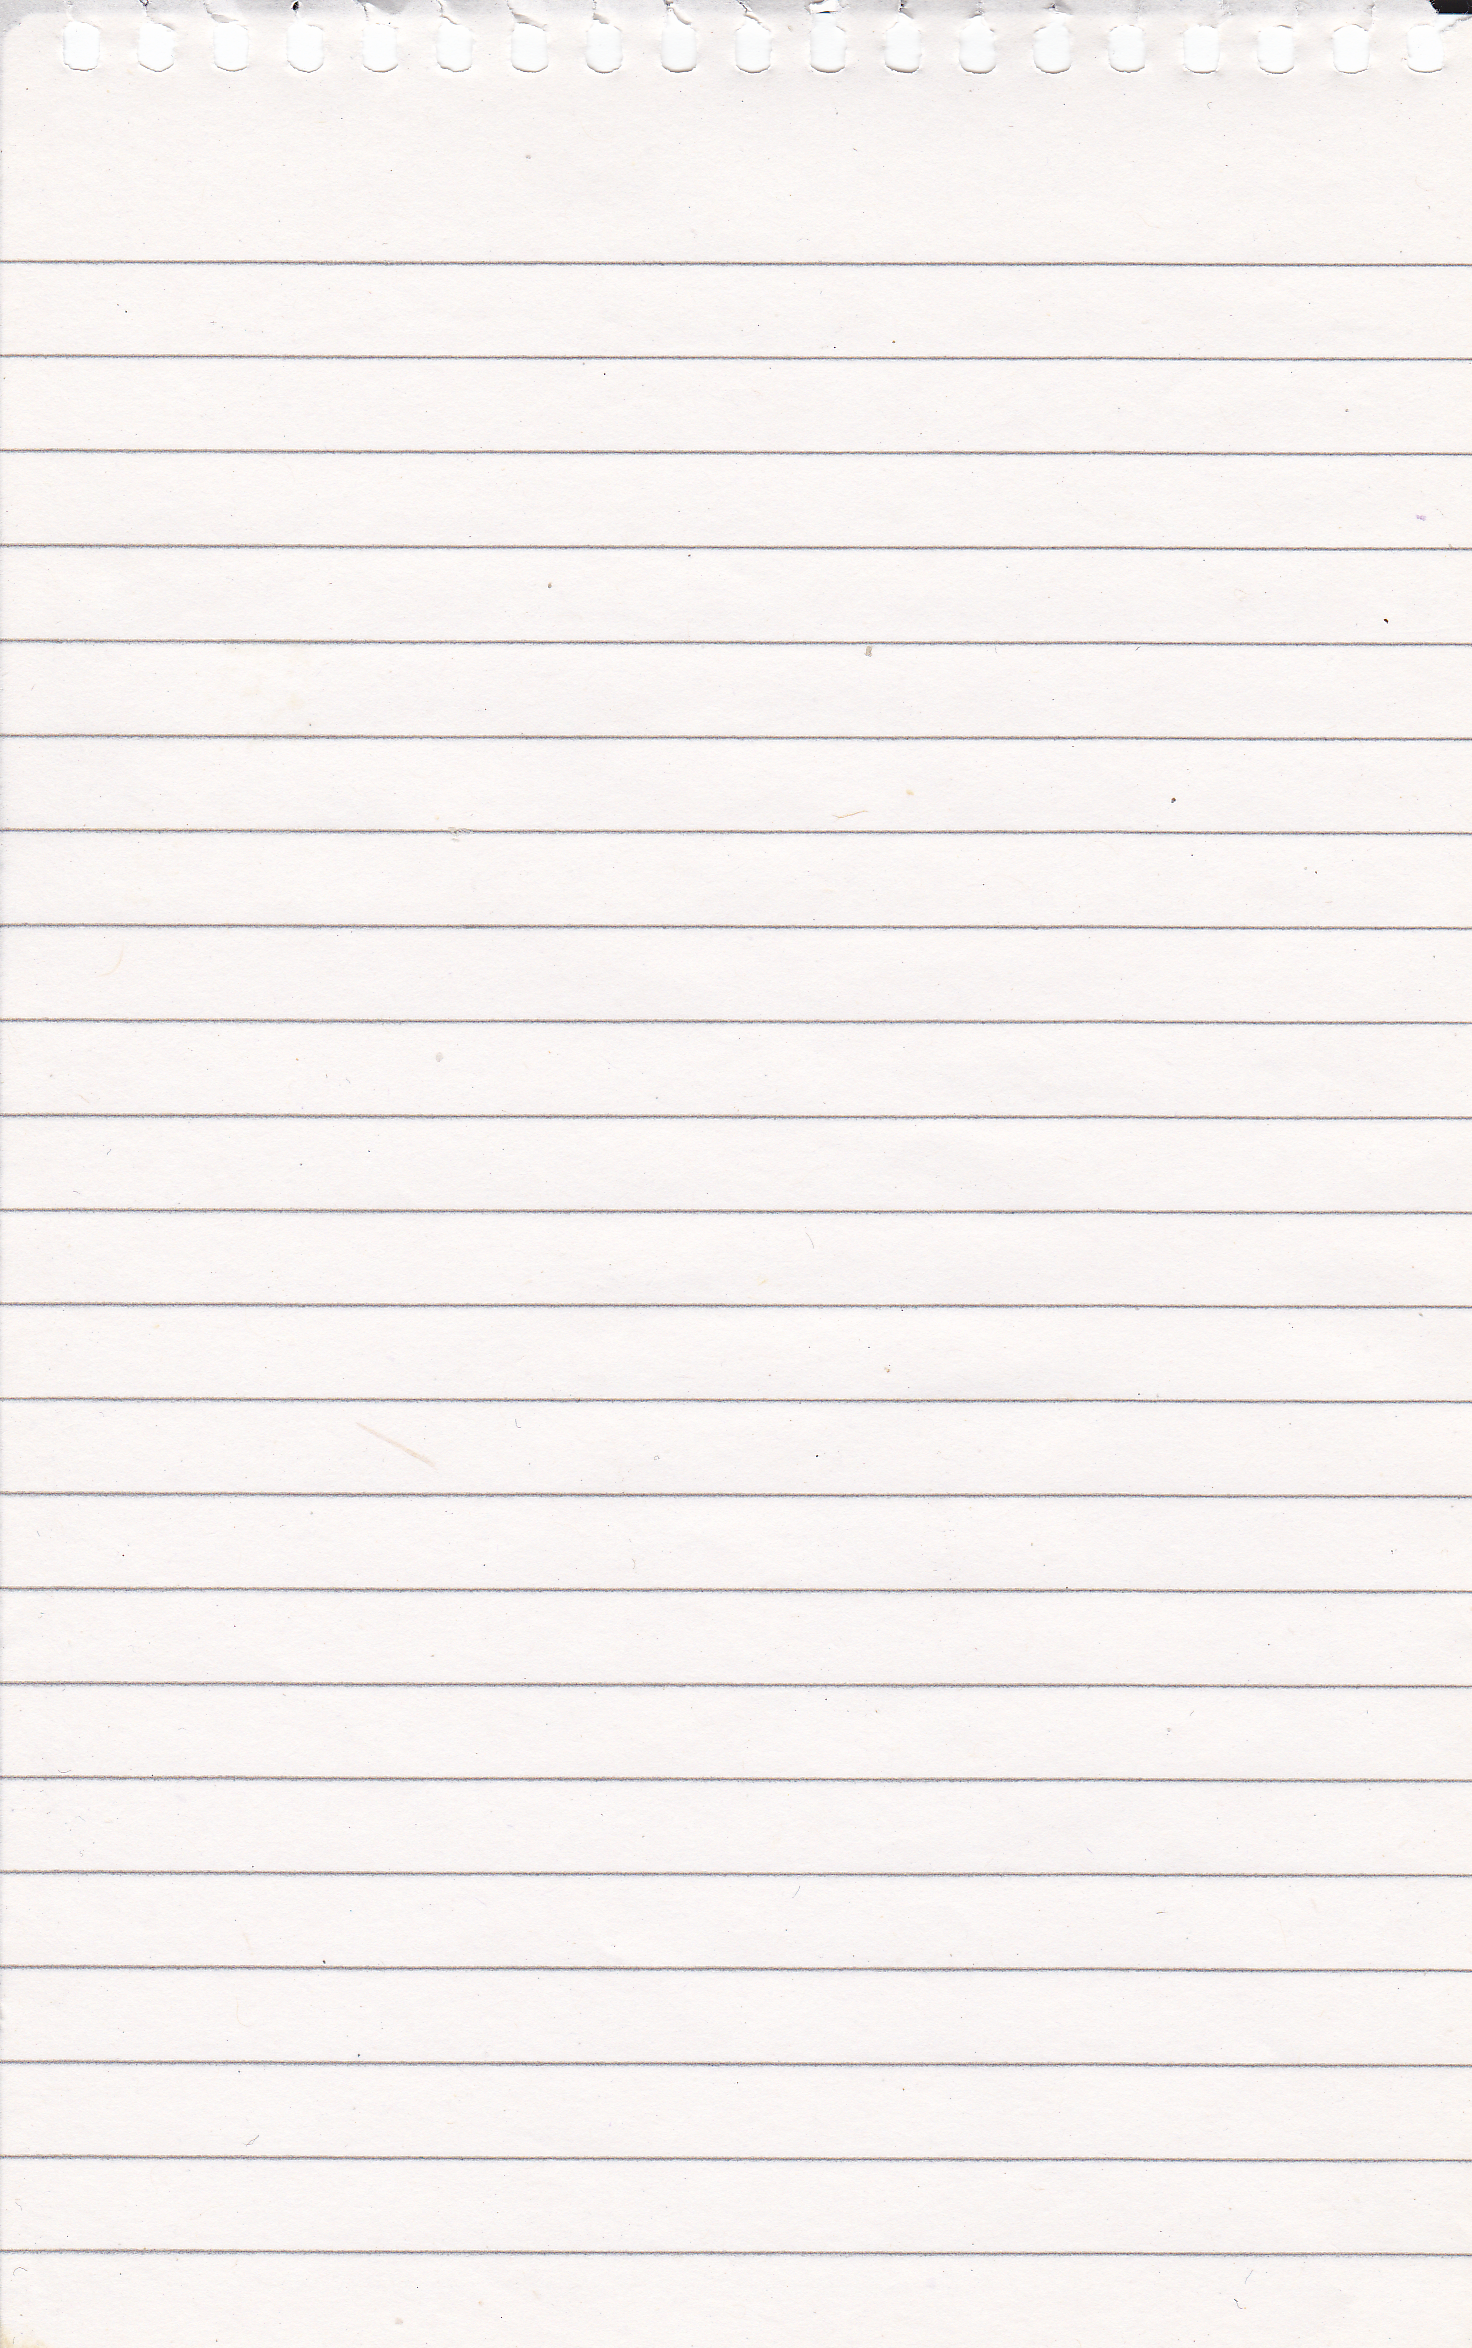 Writing Paper Texture by Satans-Comrade on DeviantArt